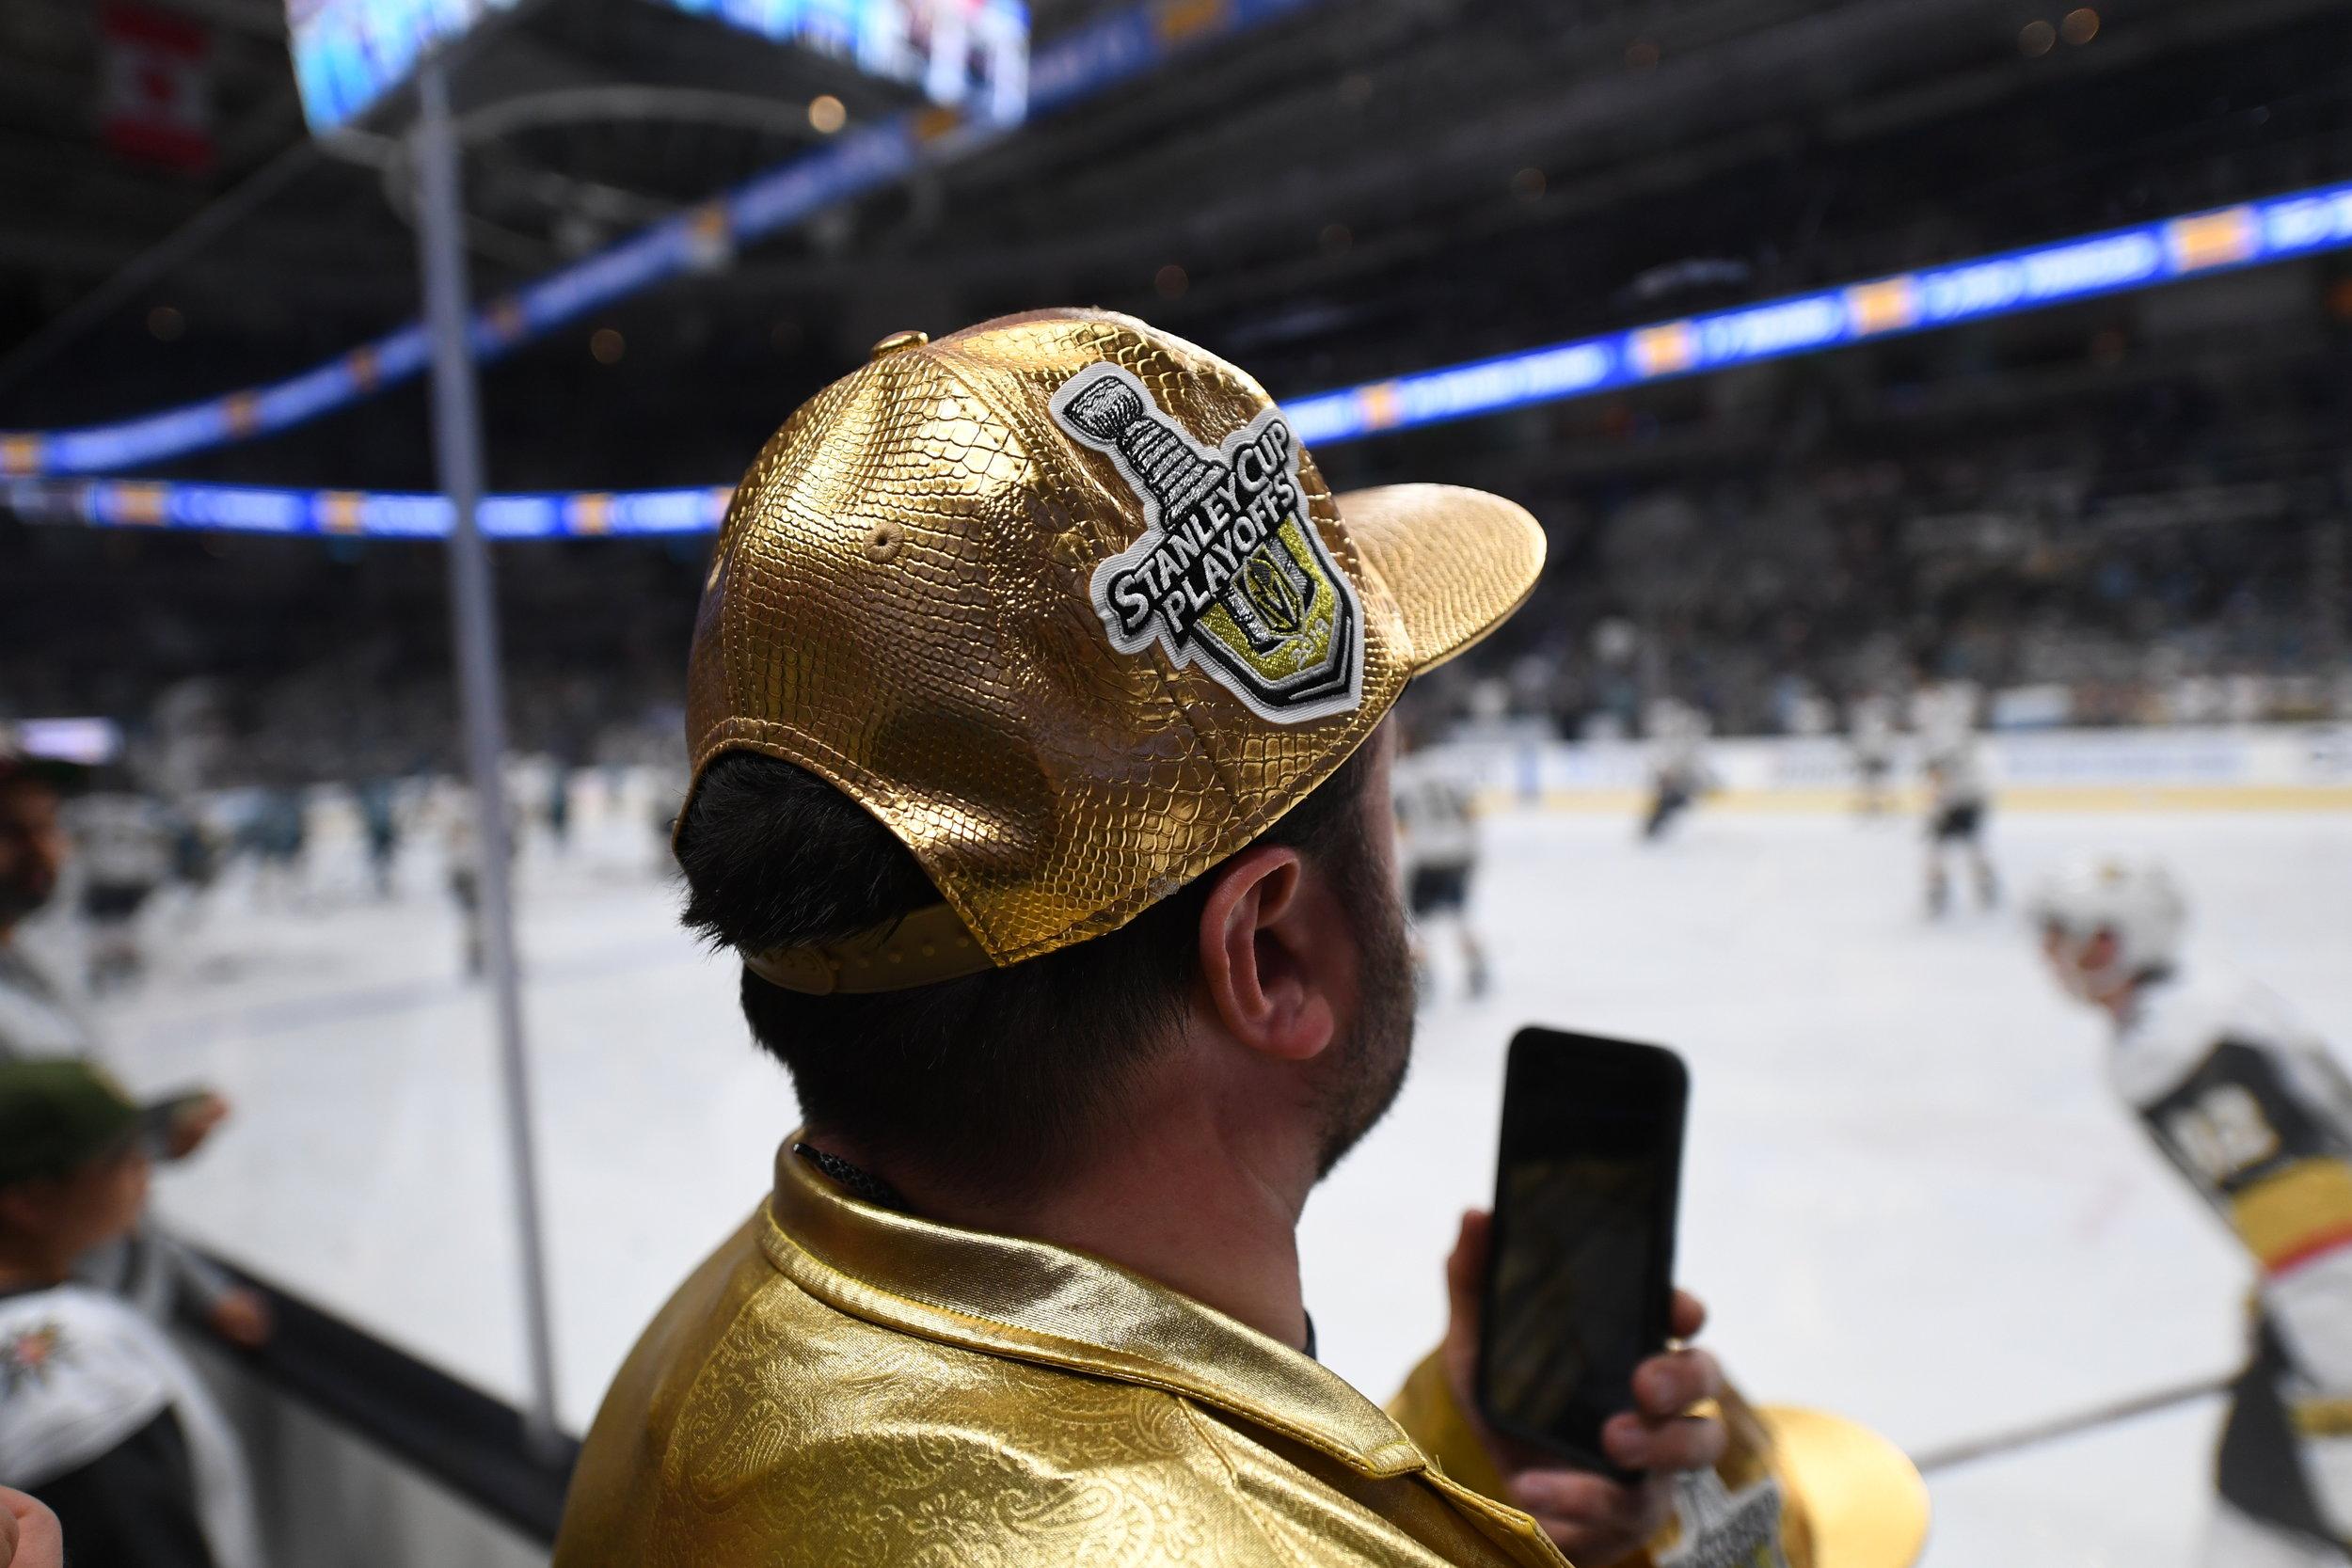 NHL_2019-04-10_0065.JPG